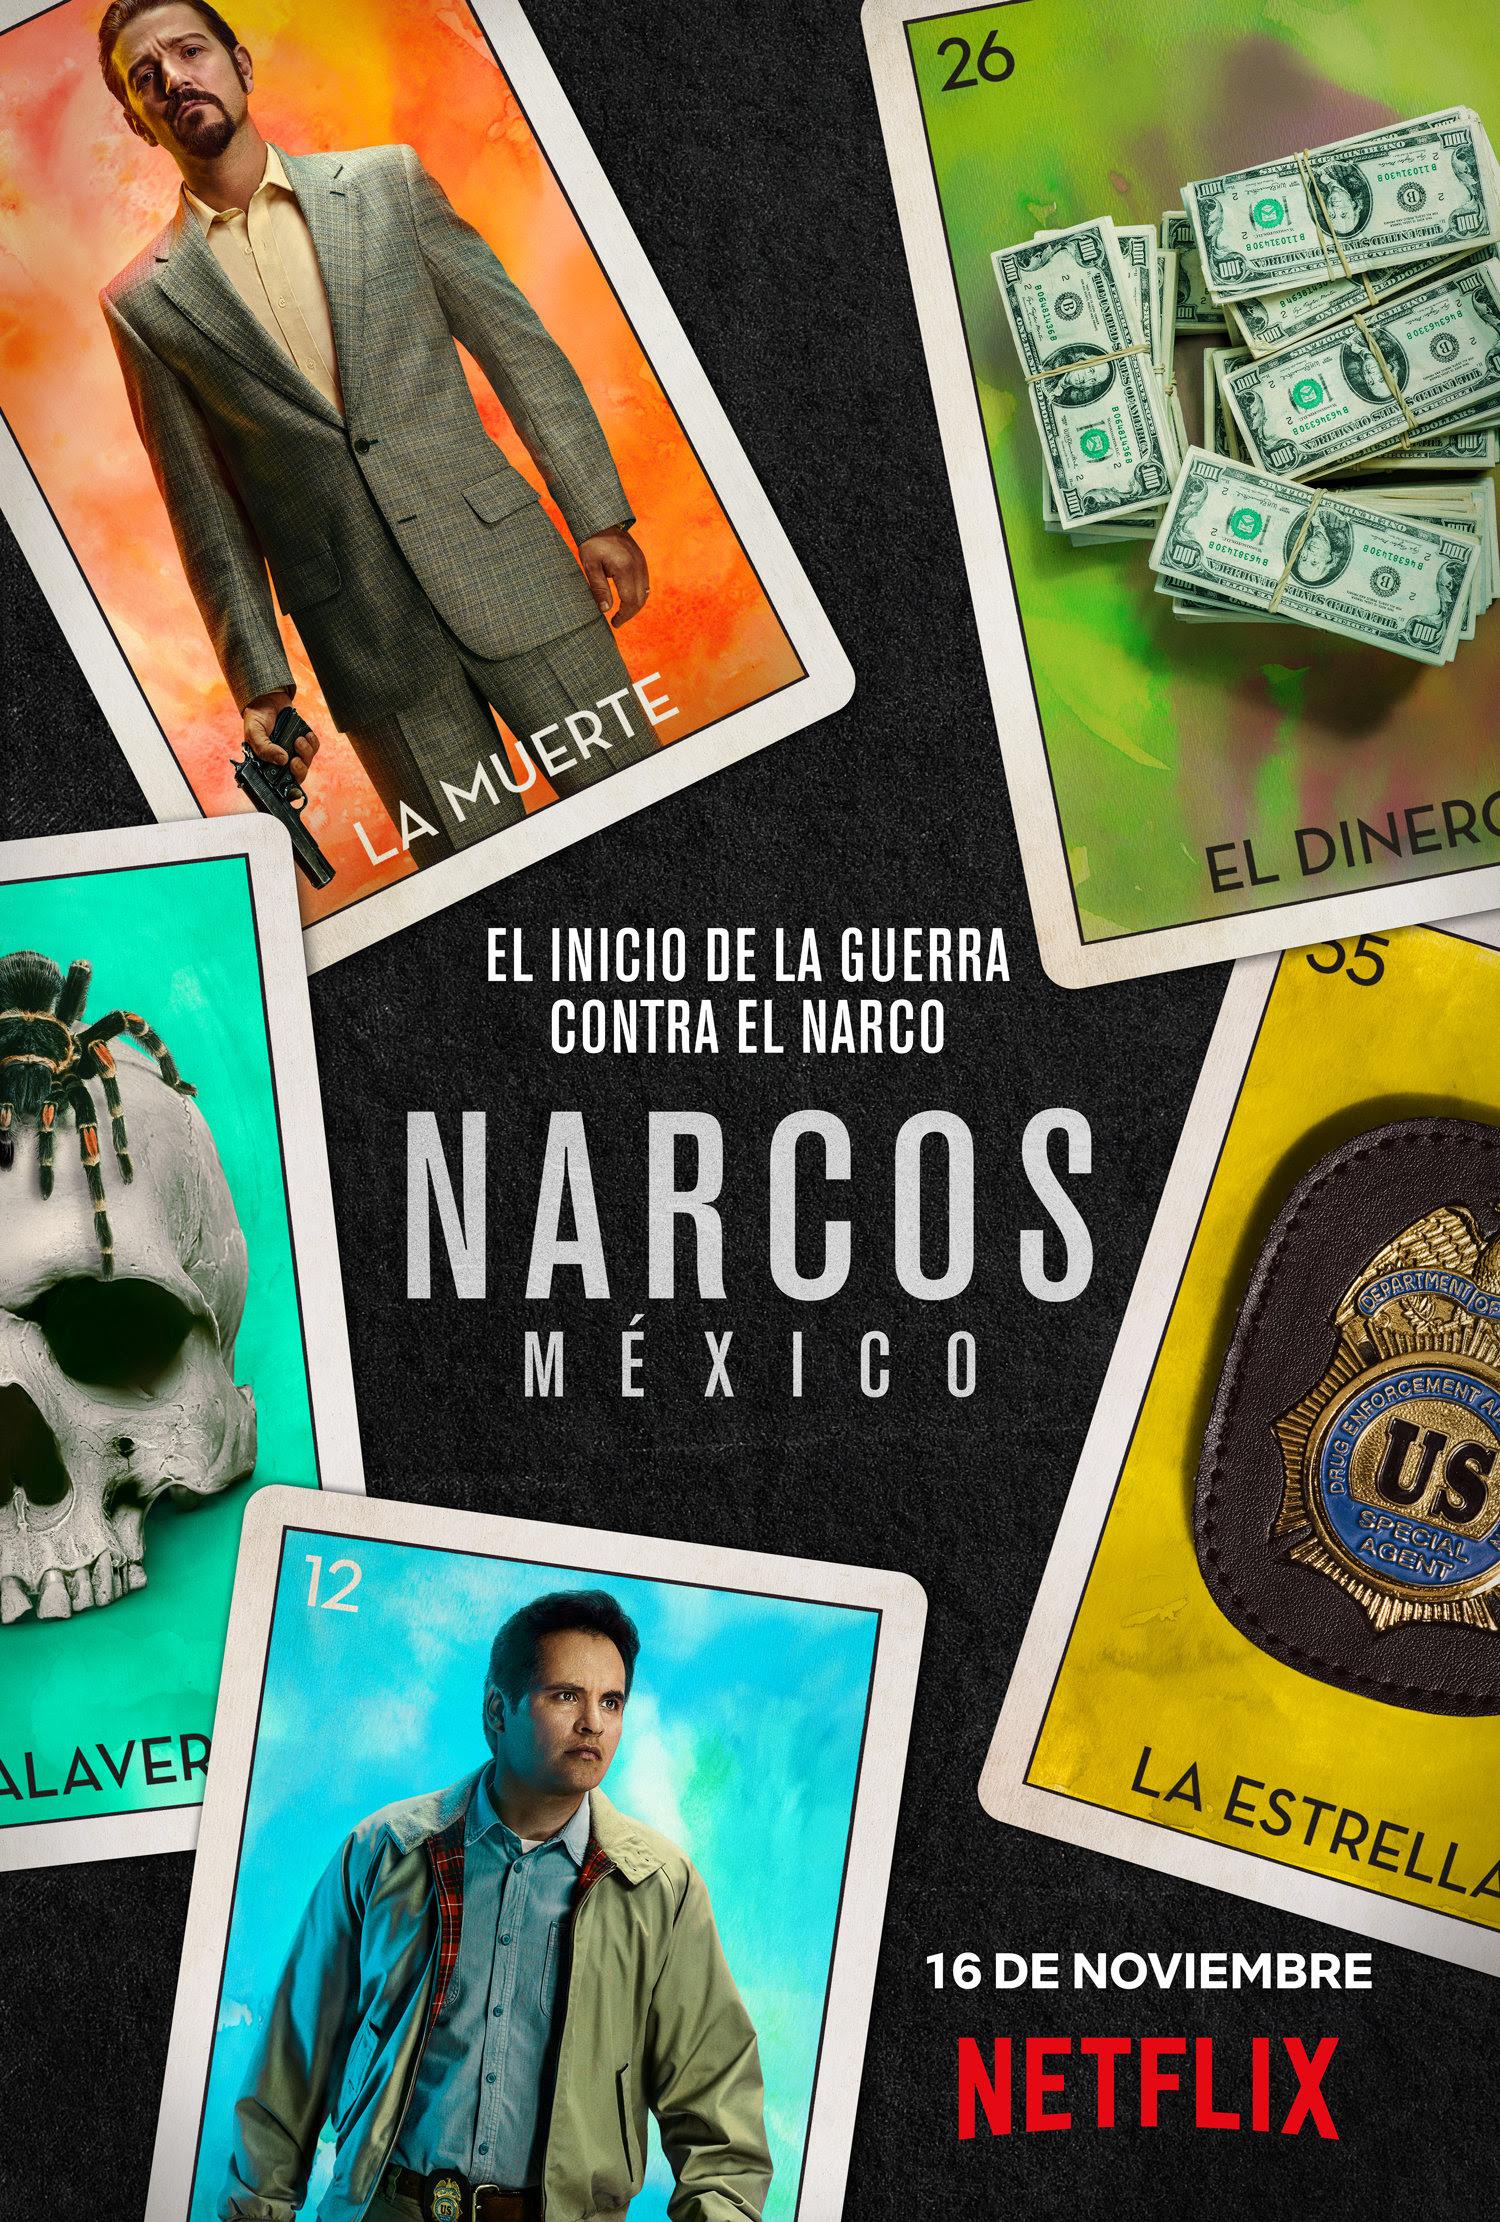 Narcos-Mexico-Diego Luna-02